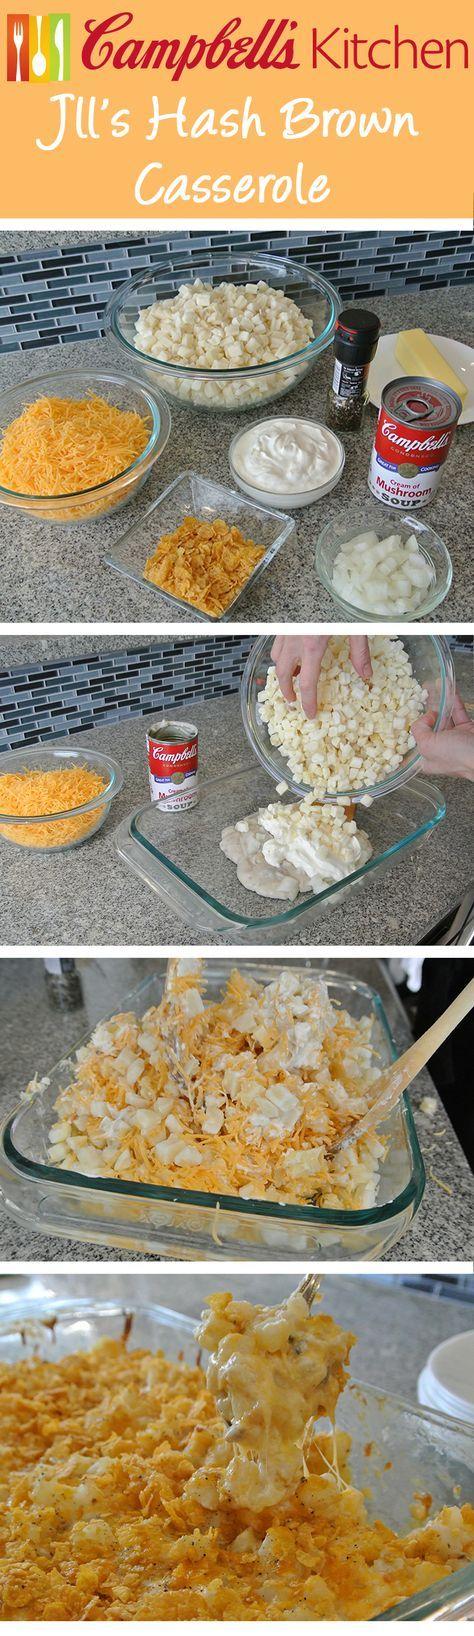 Jill's Hash Brown Casserole Recipe - Perfect for brunch or breakfast!